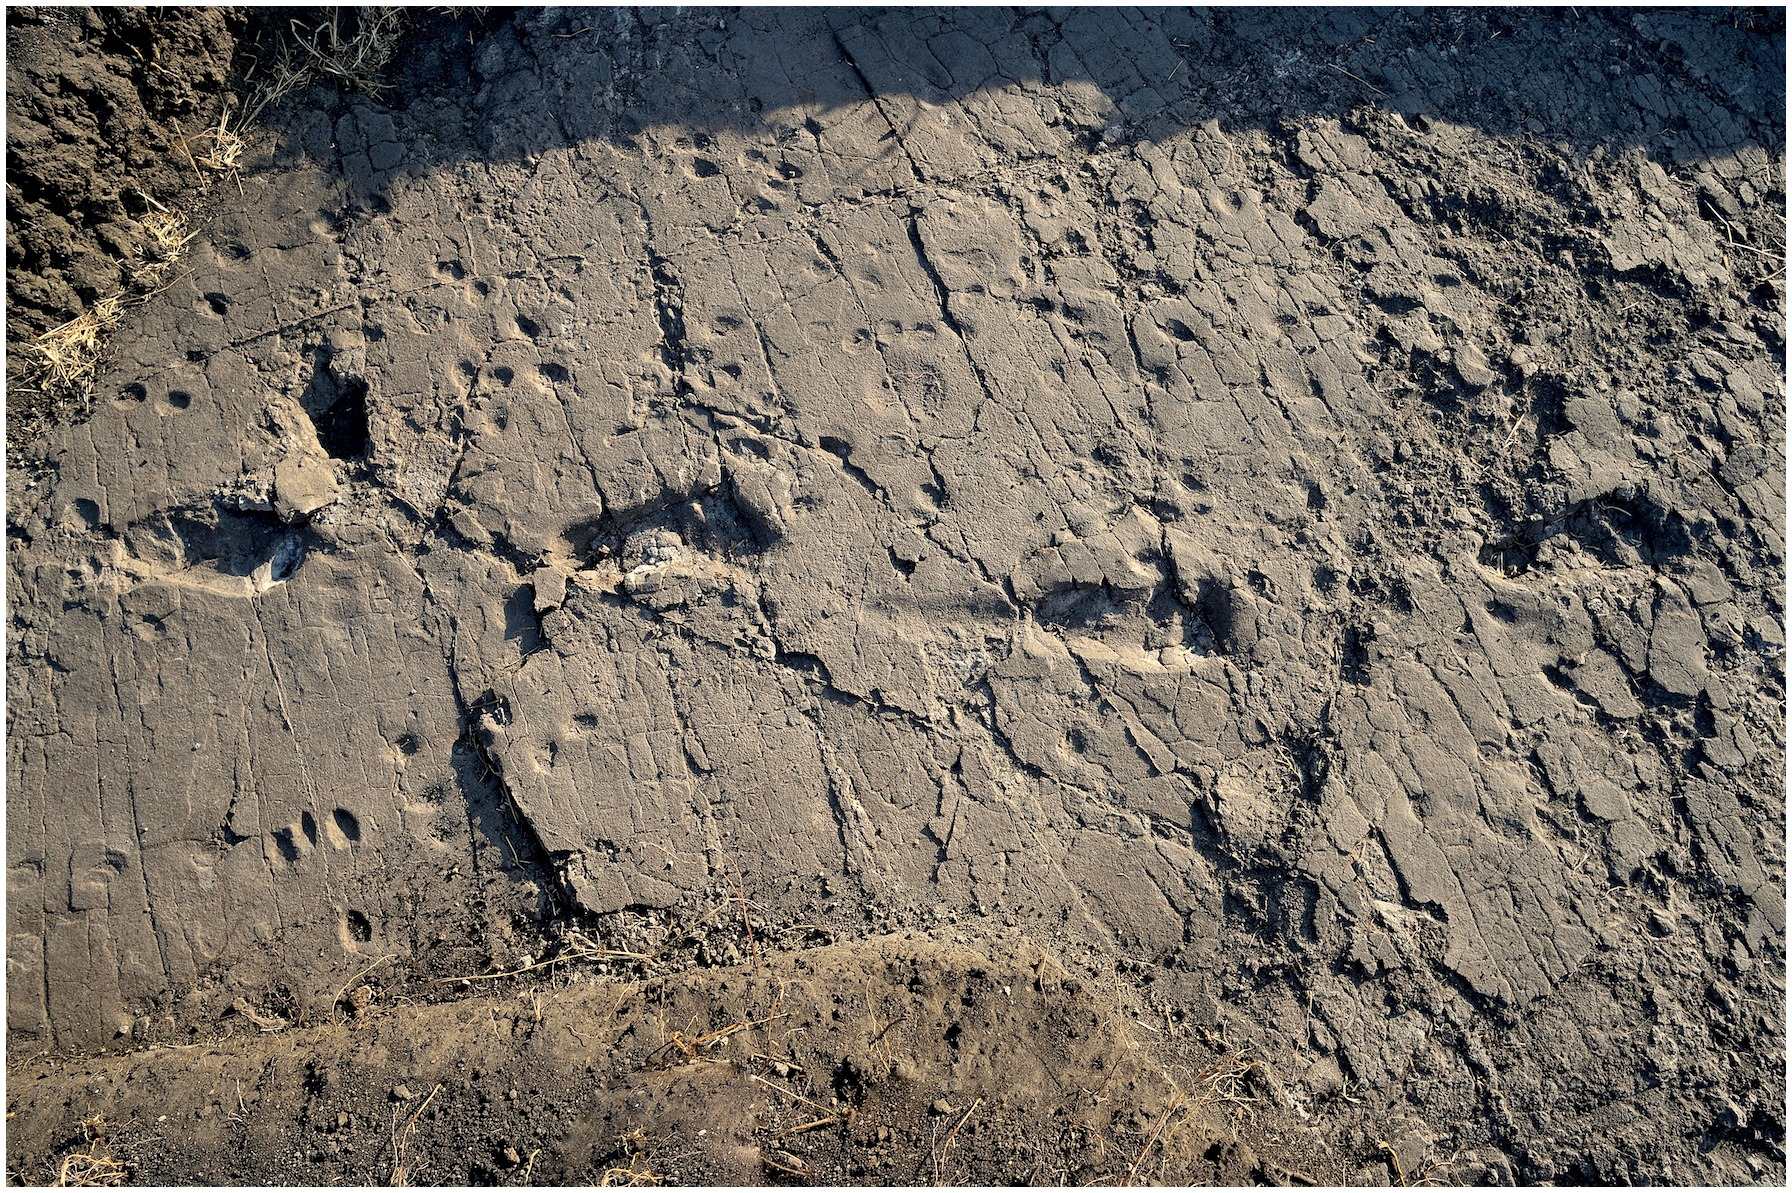 Huellas de 'Australopithecus afarensis' (Tanzania)